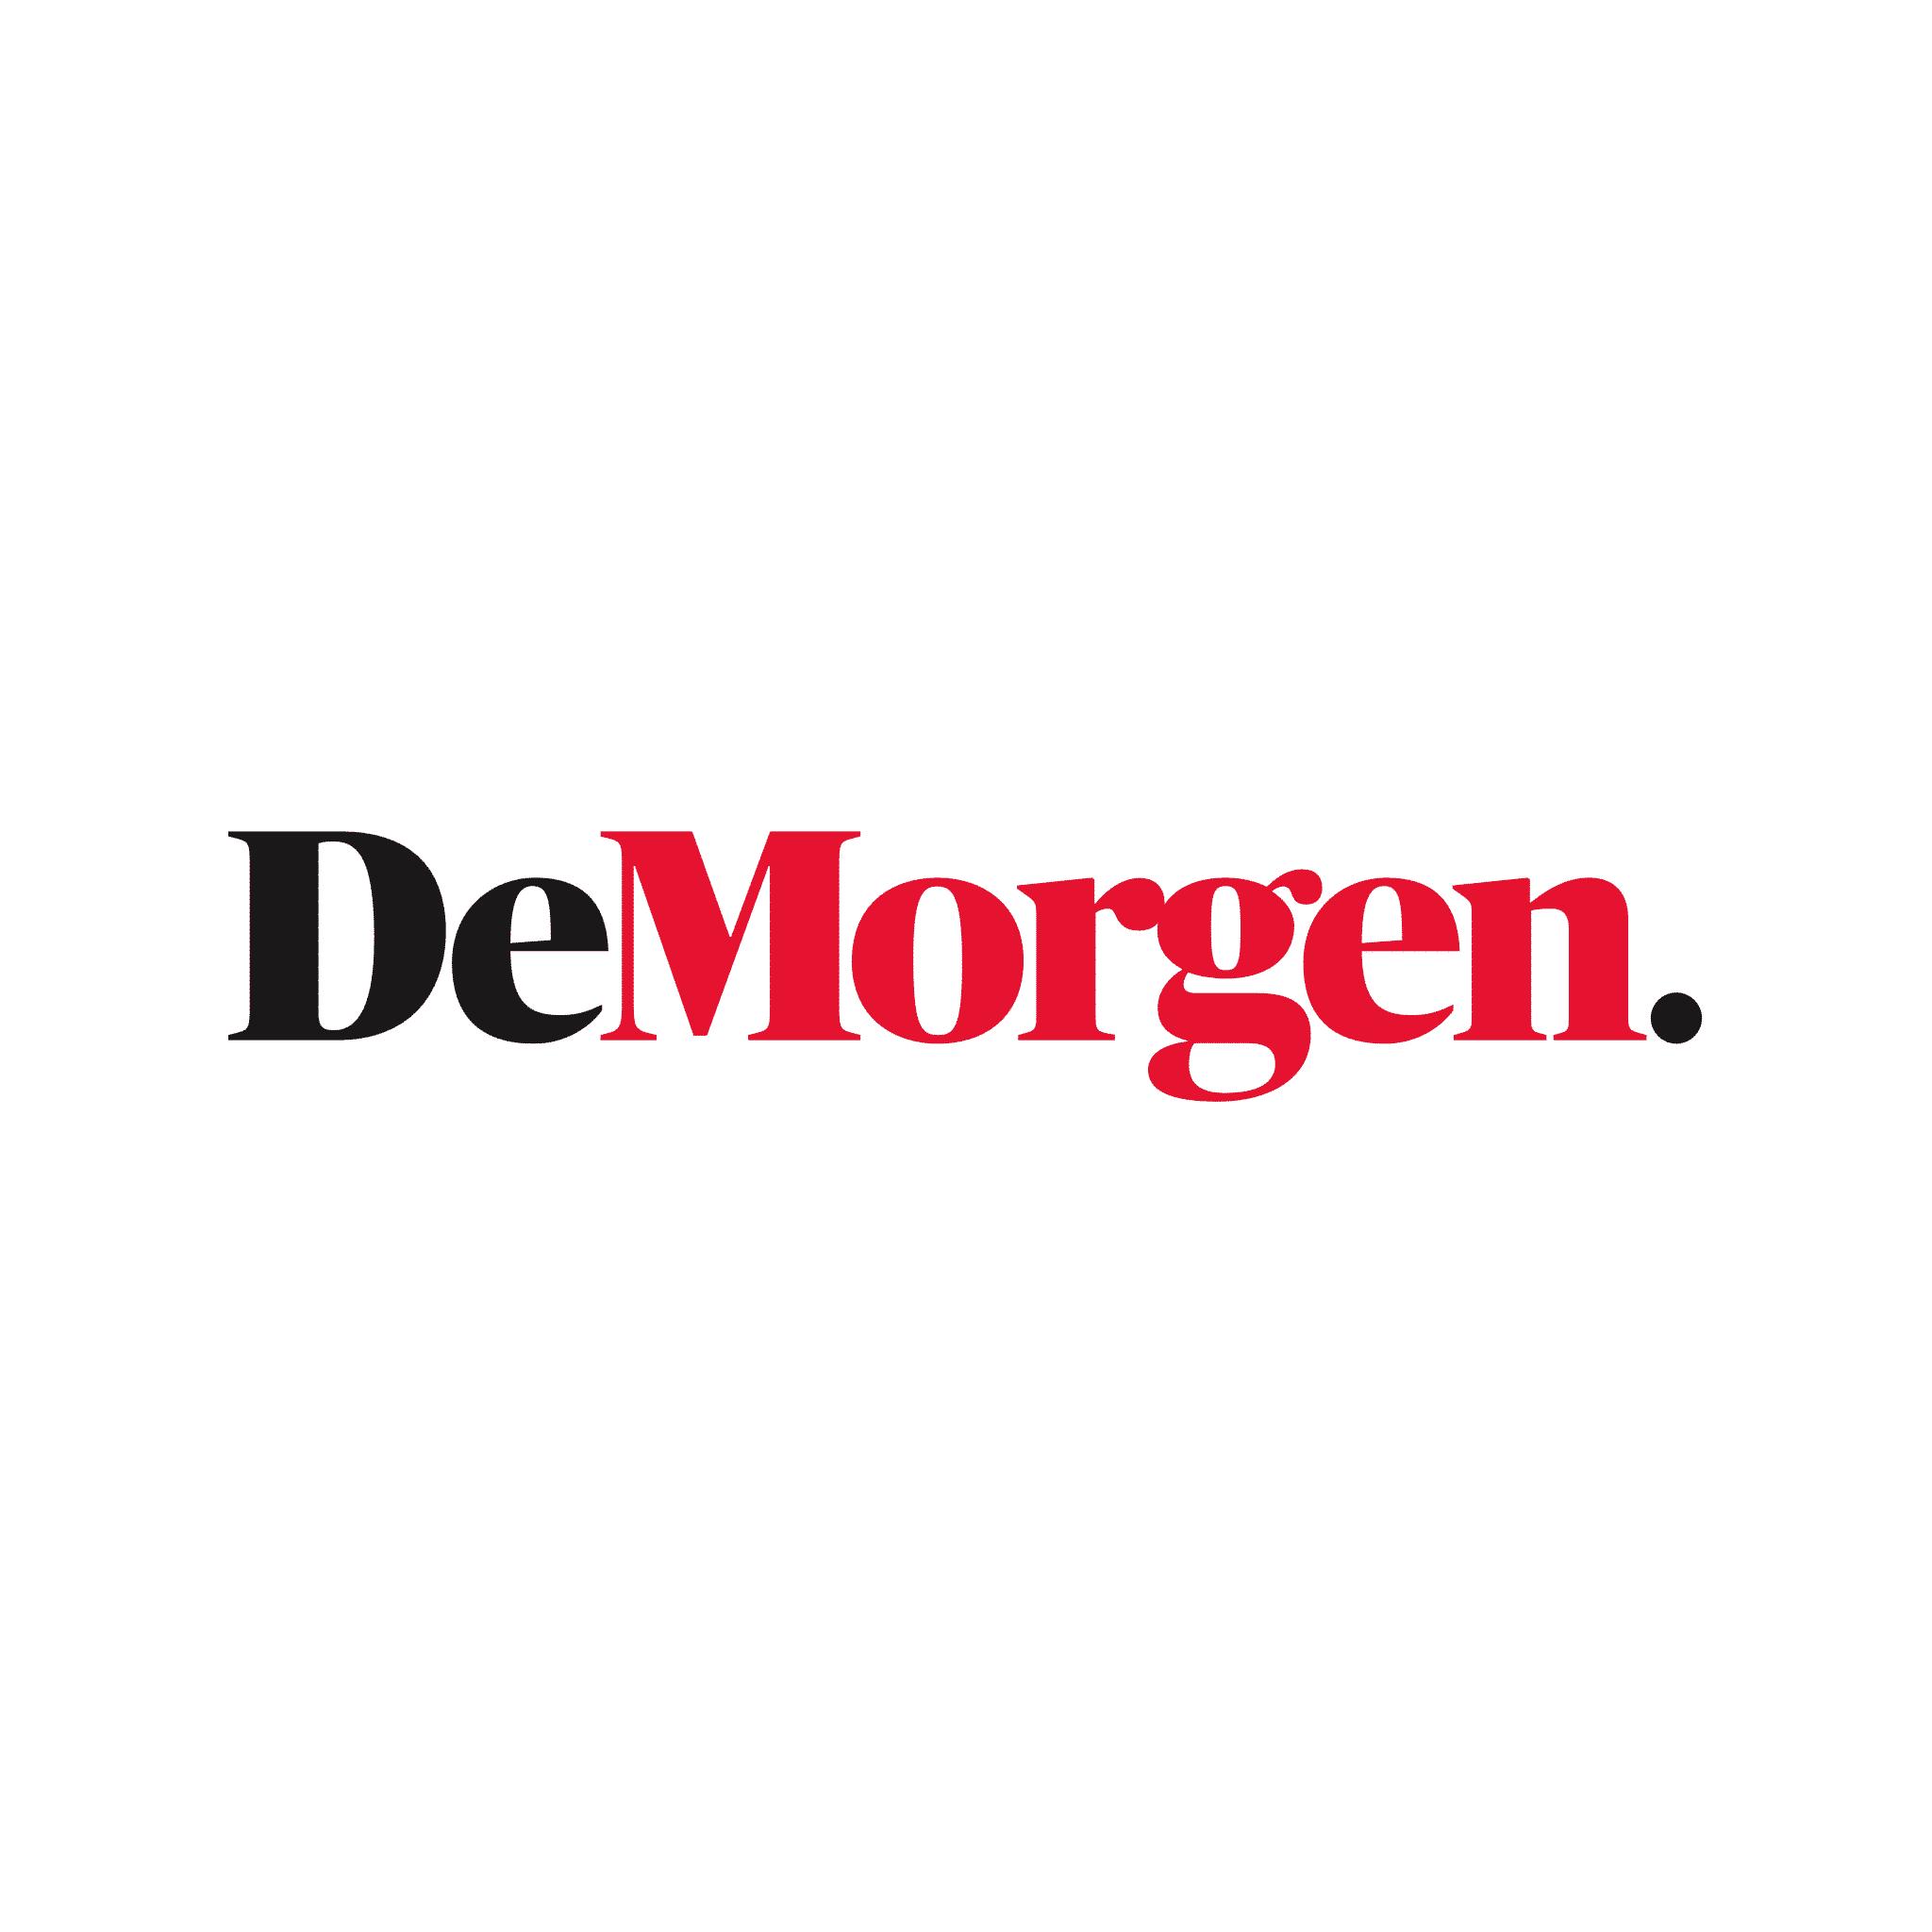 demorgen-logo